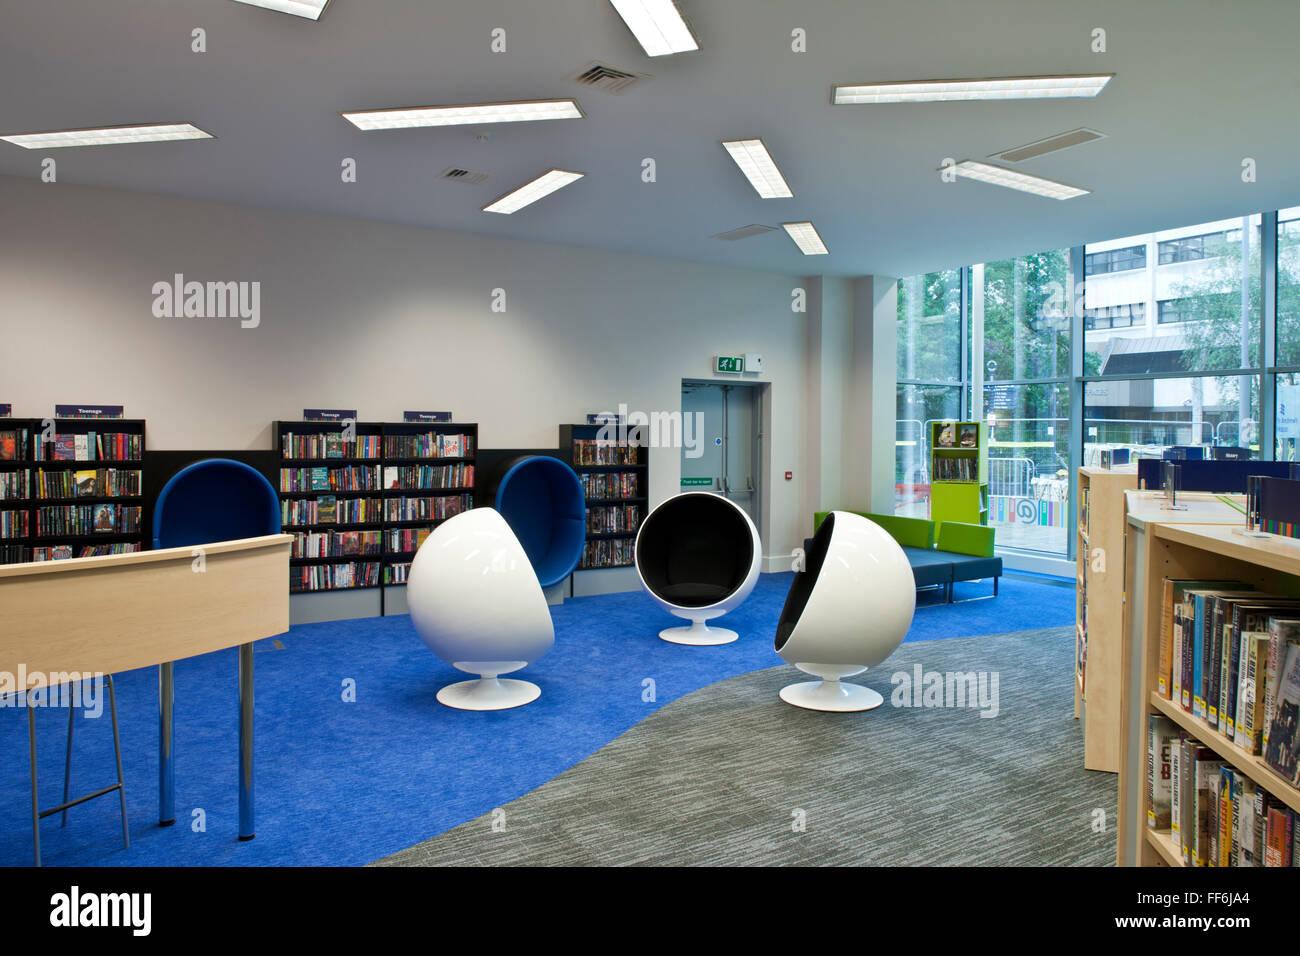 Woking Library Woking Surrey - Stock Image